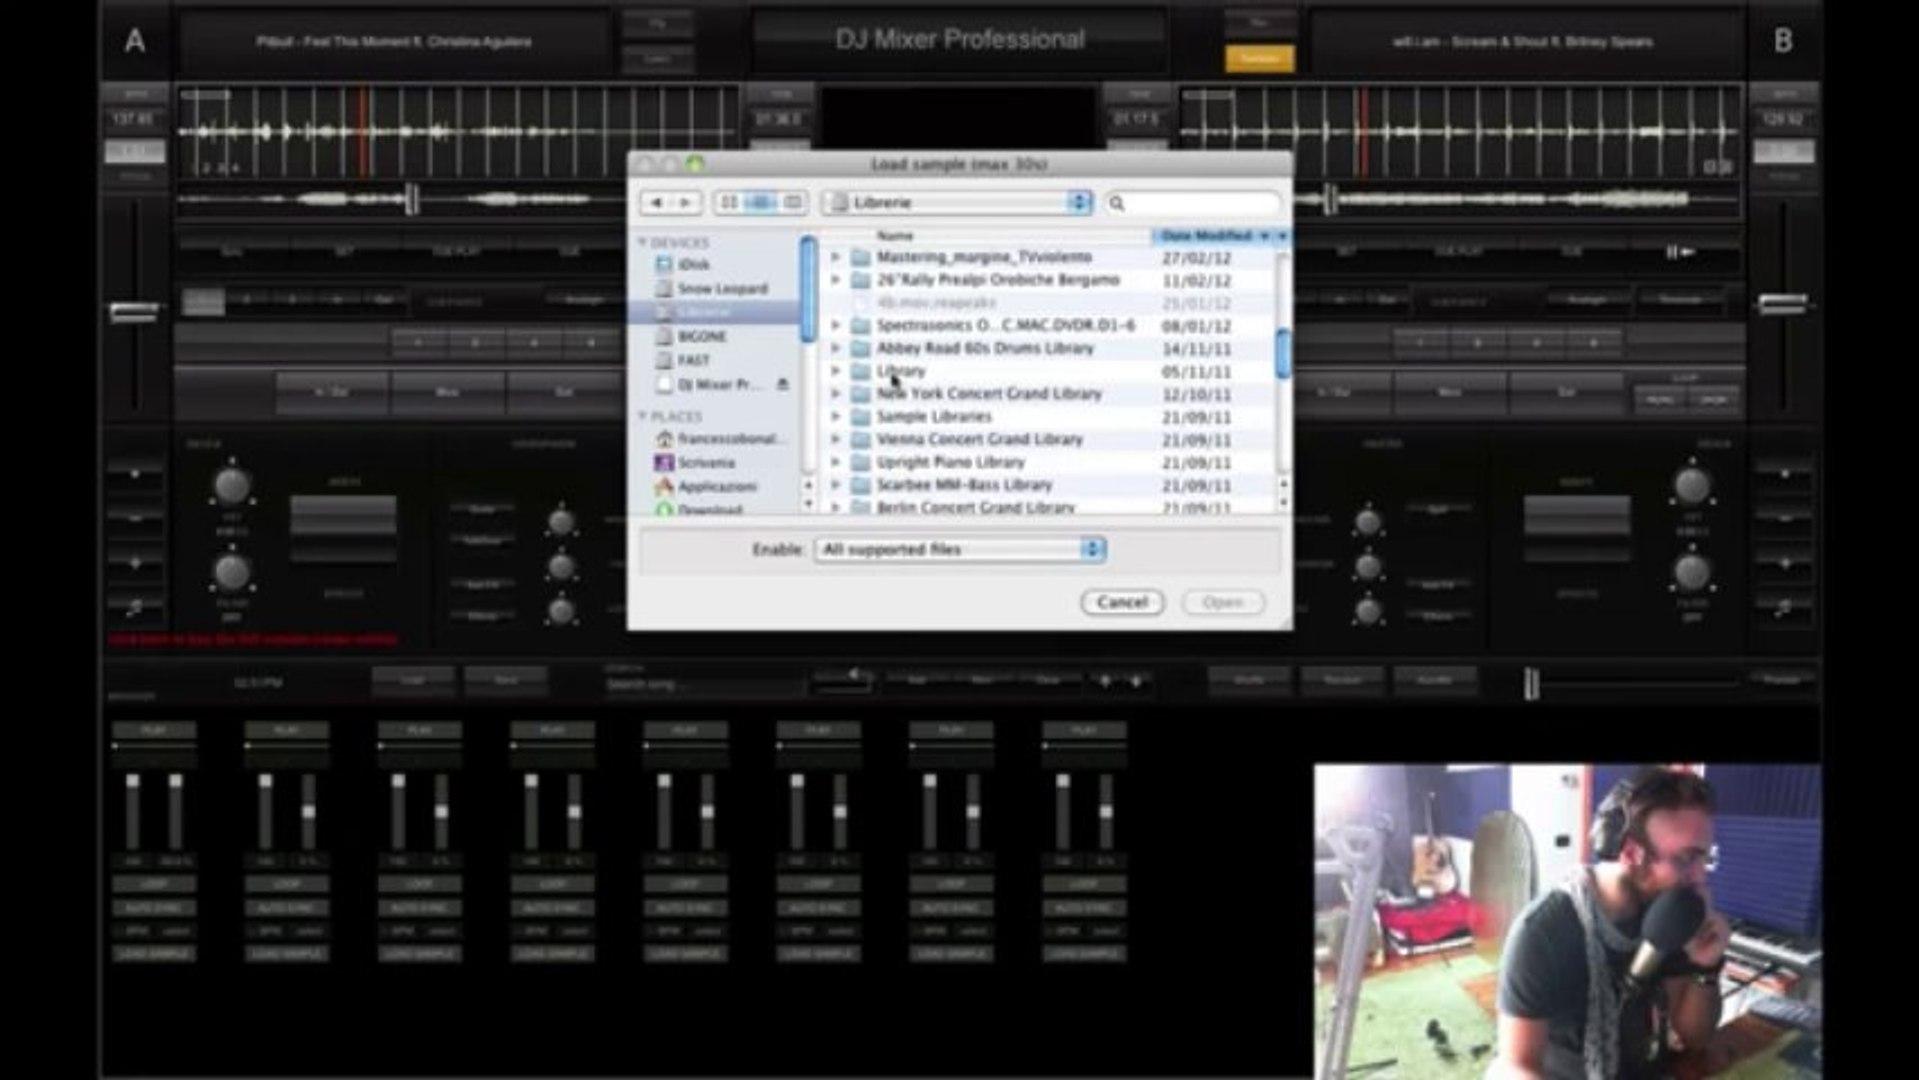 DJ Mixer Pro Review - Best DJ Mixing Software